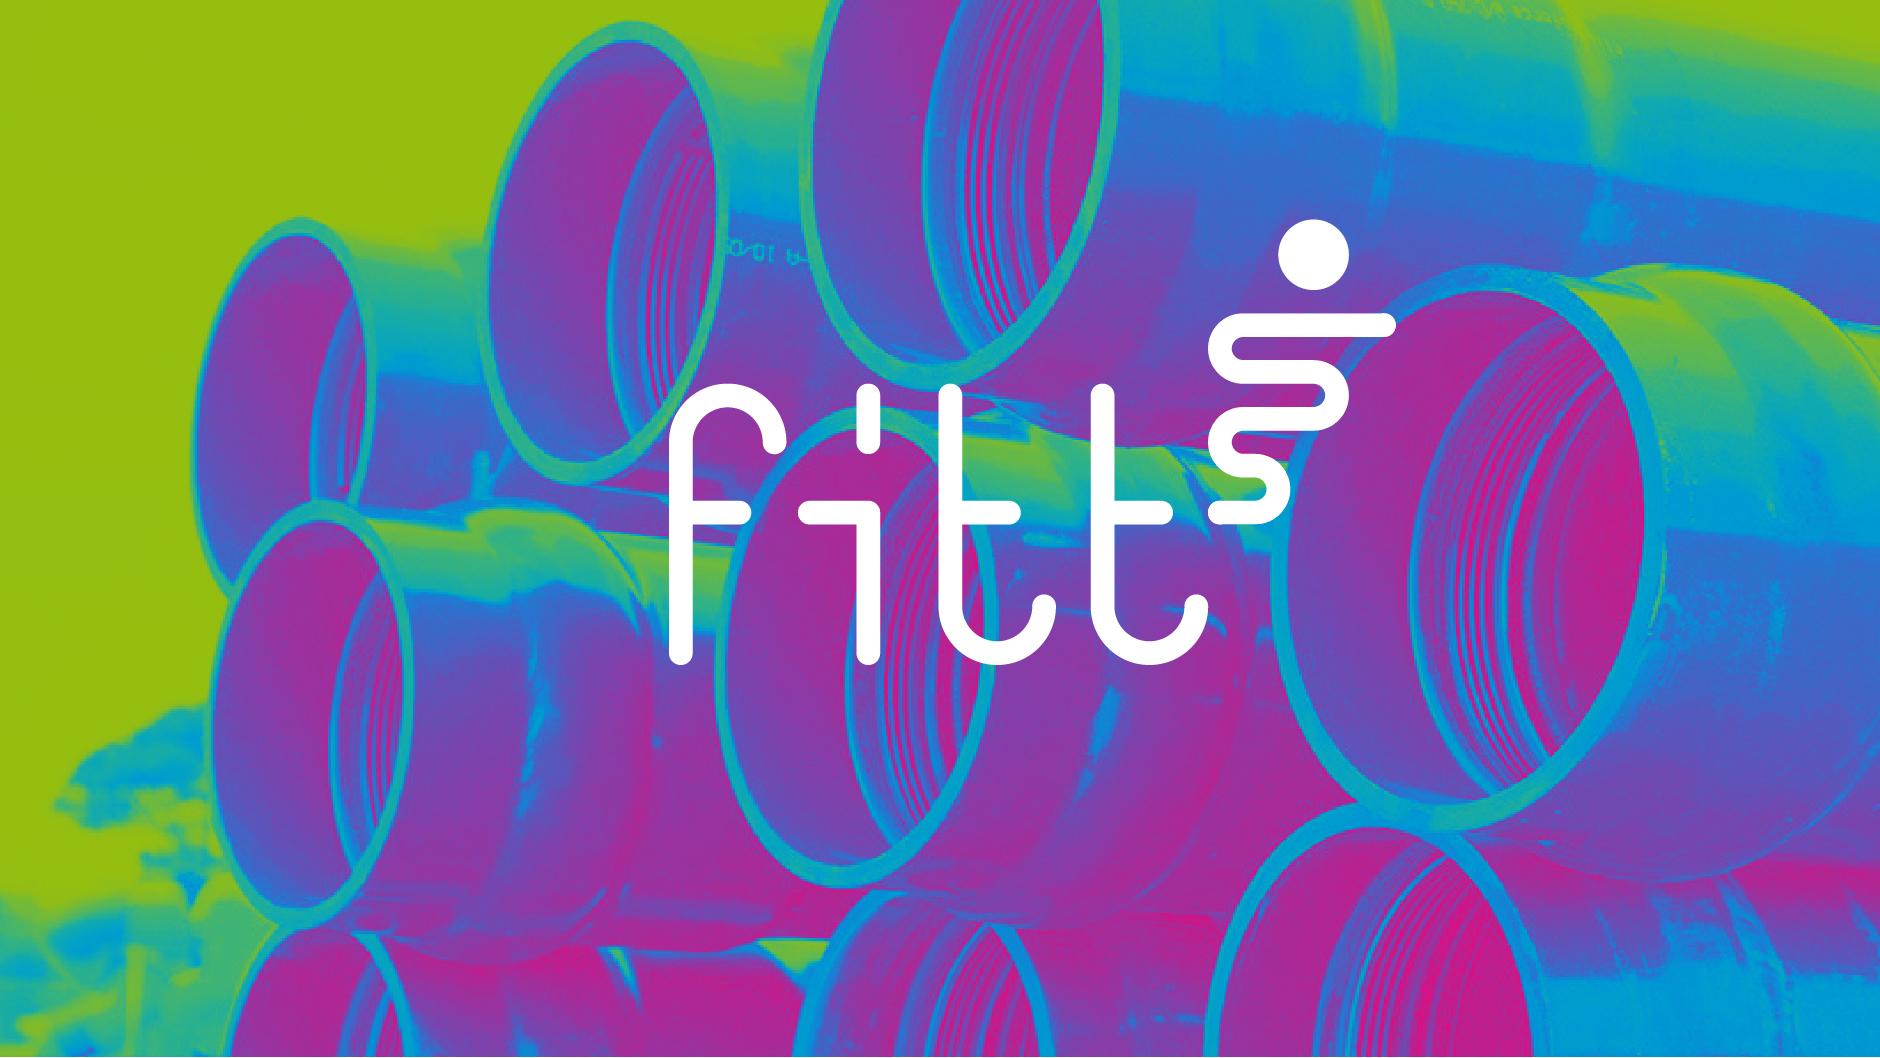 Fitt trademark su immagine postprodotta di tubi